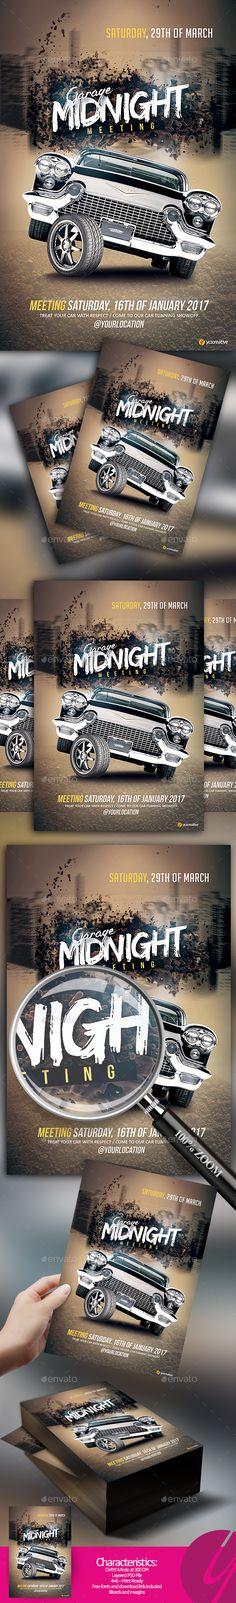 Garage Midnight Meeting — Photoshop PSD #race #hot • Download ➝ https://graphicriver.net/item/garage-midnight-meeting/19190975?ref=pxcr